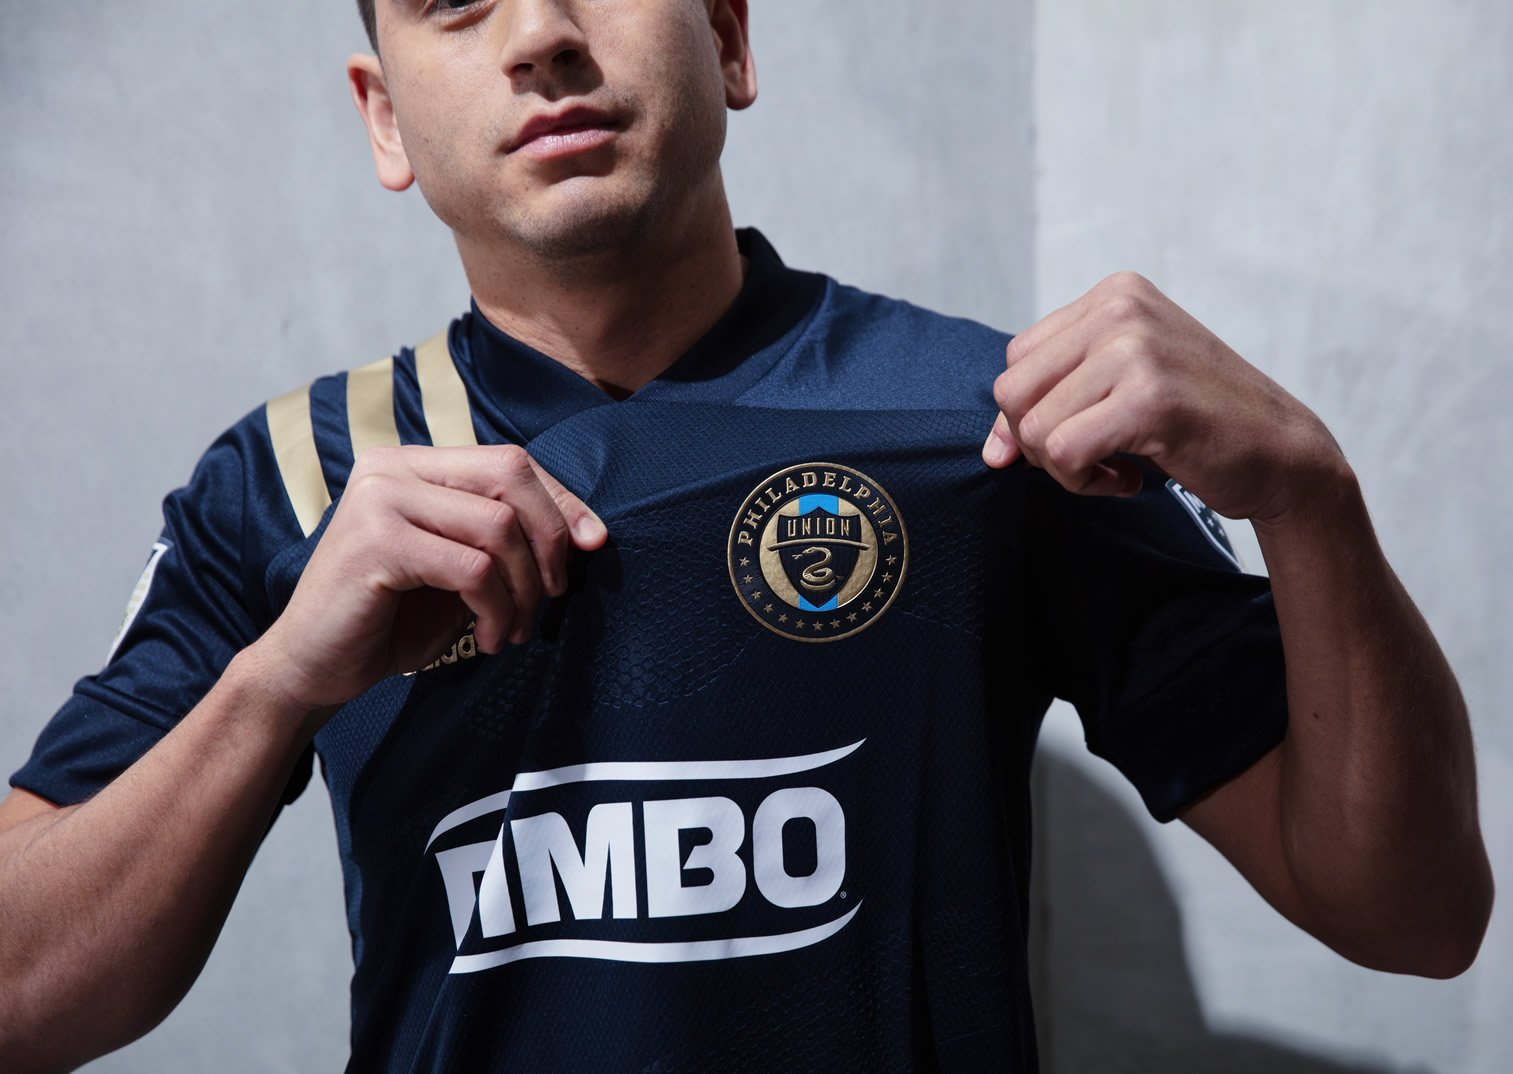 Camiseta Adidas del Philadelphia Union 2020/21 | Imagen Web Oficial